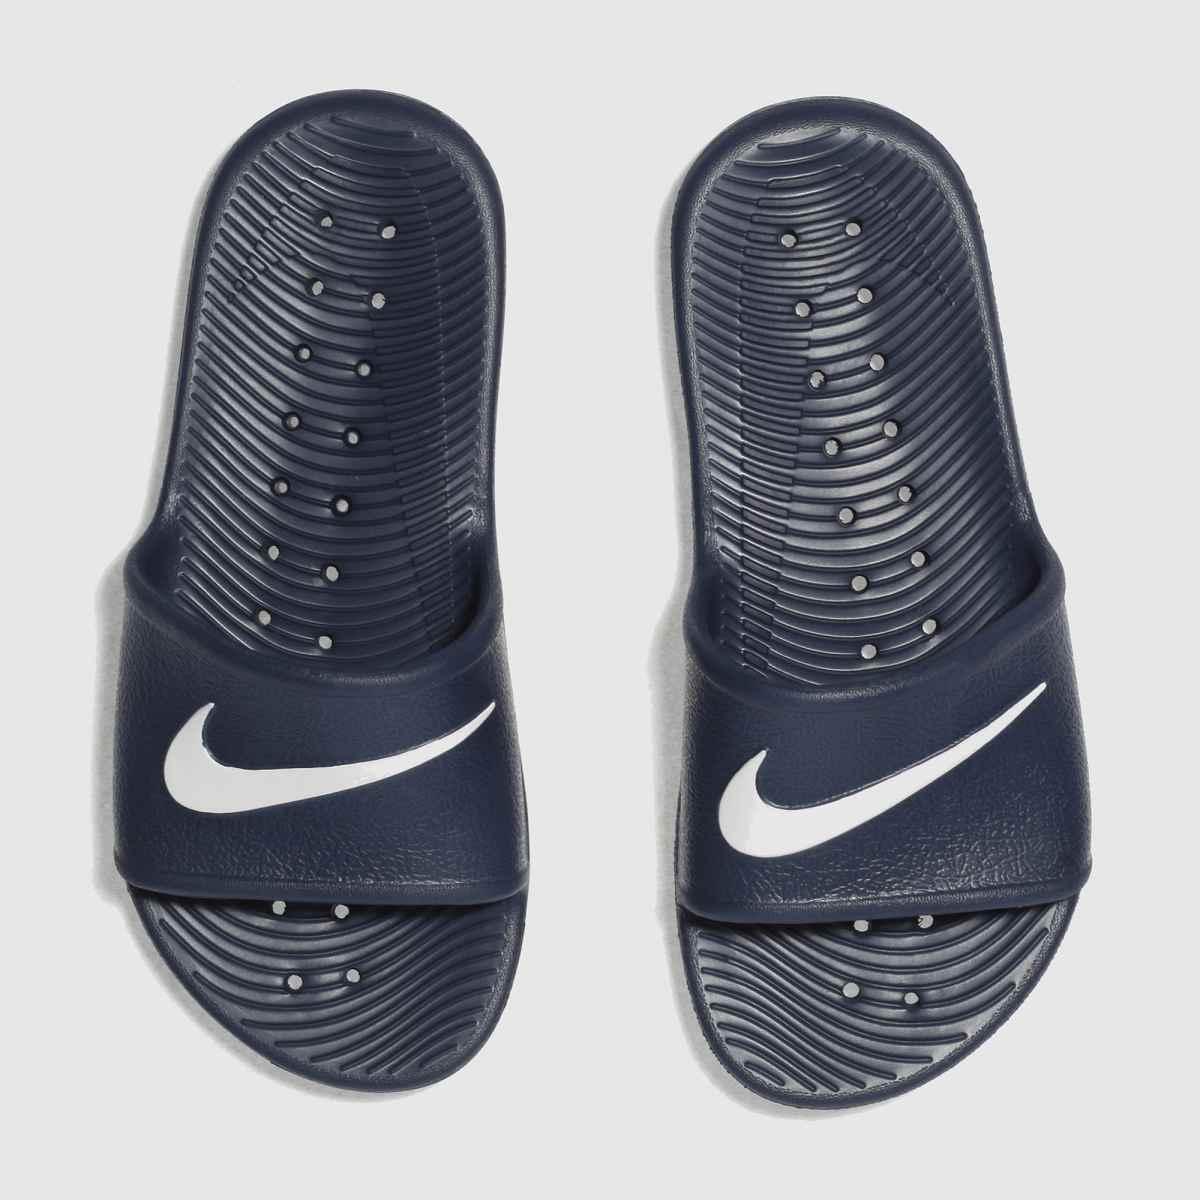 Nike Navy & White Kawa Shower Boys Youth Sandals